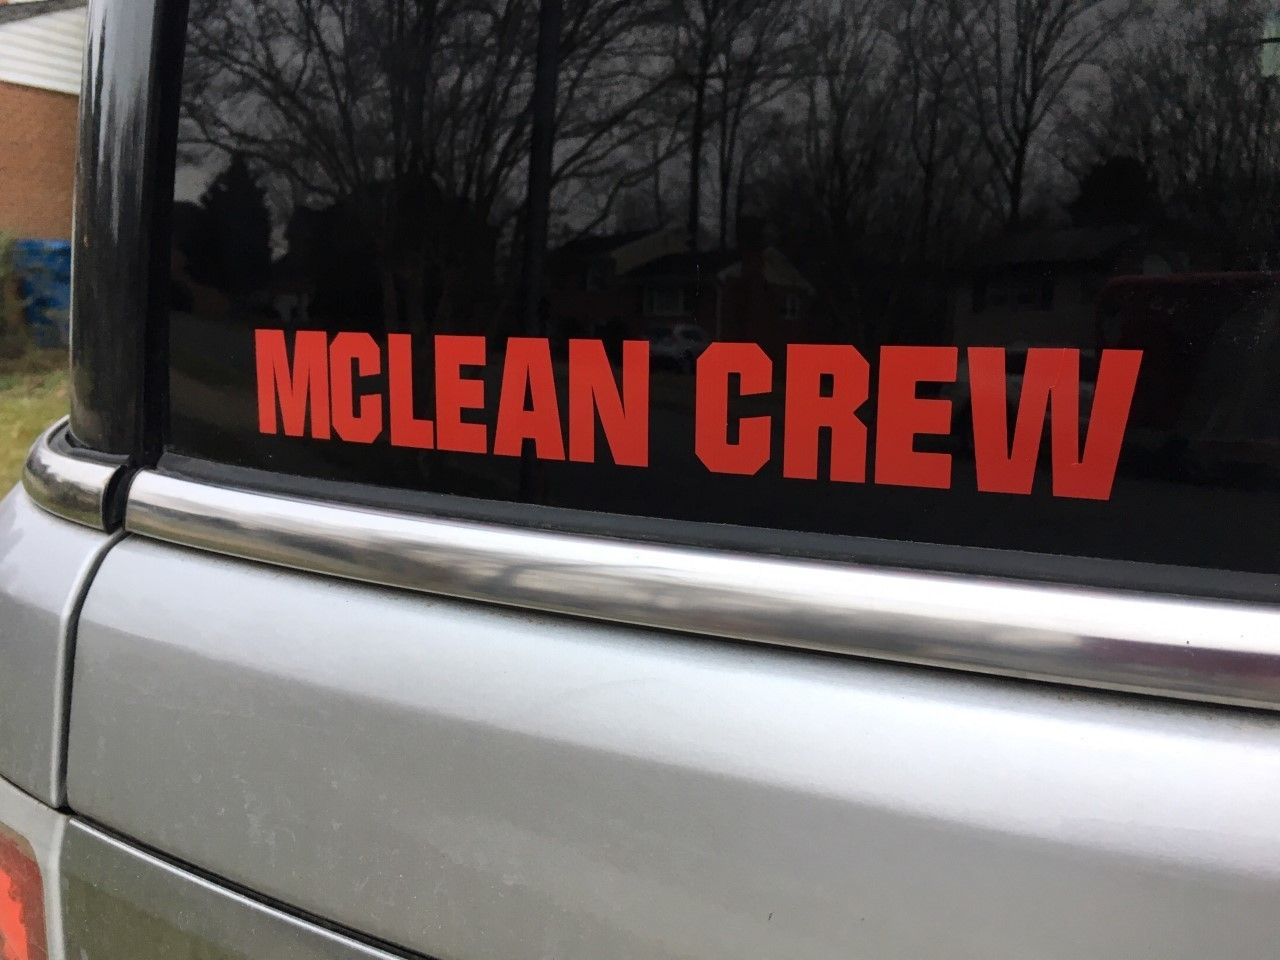 McLean Crew Car Sticker